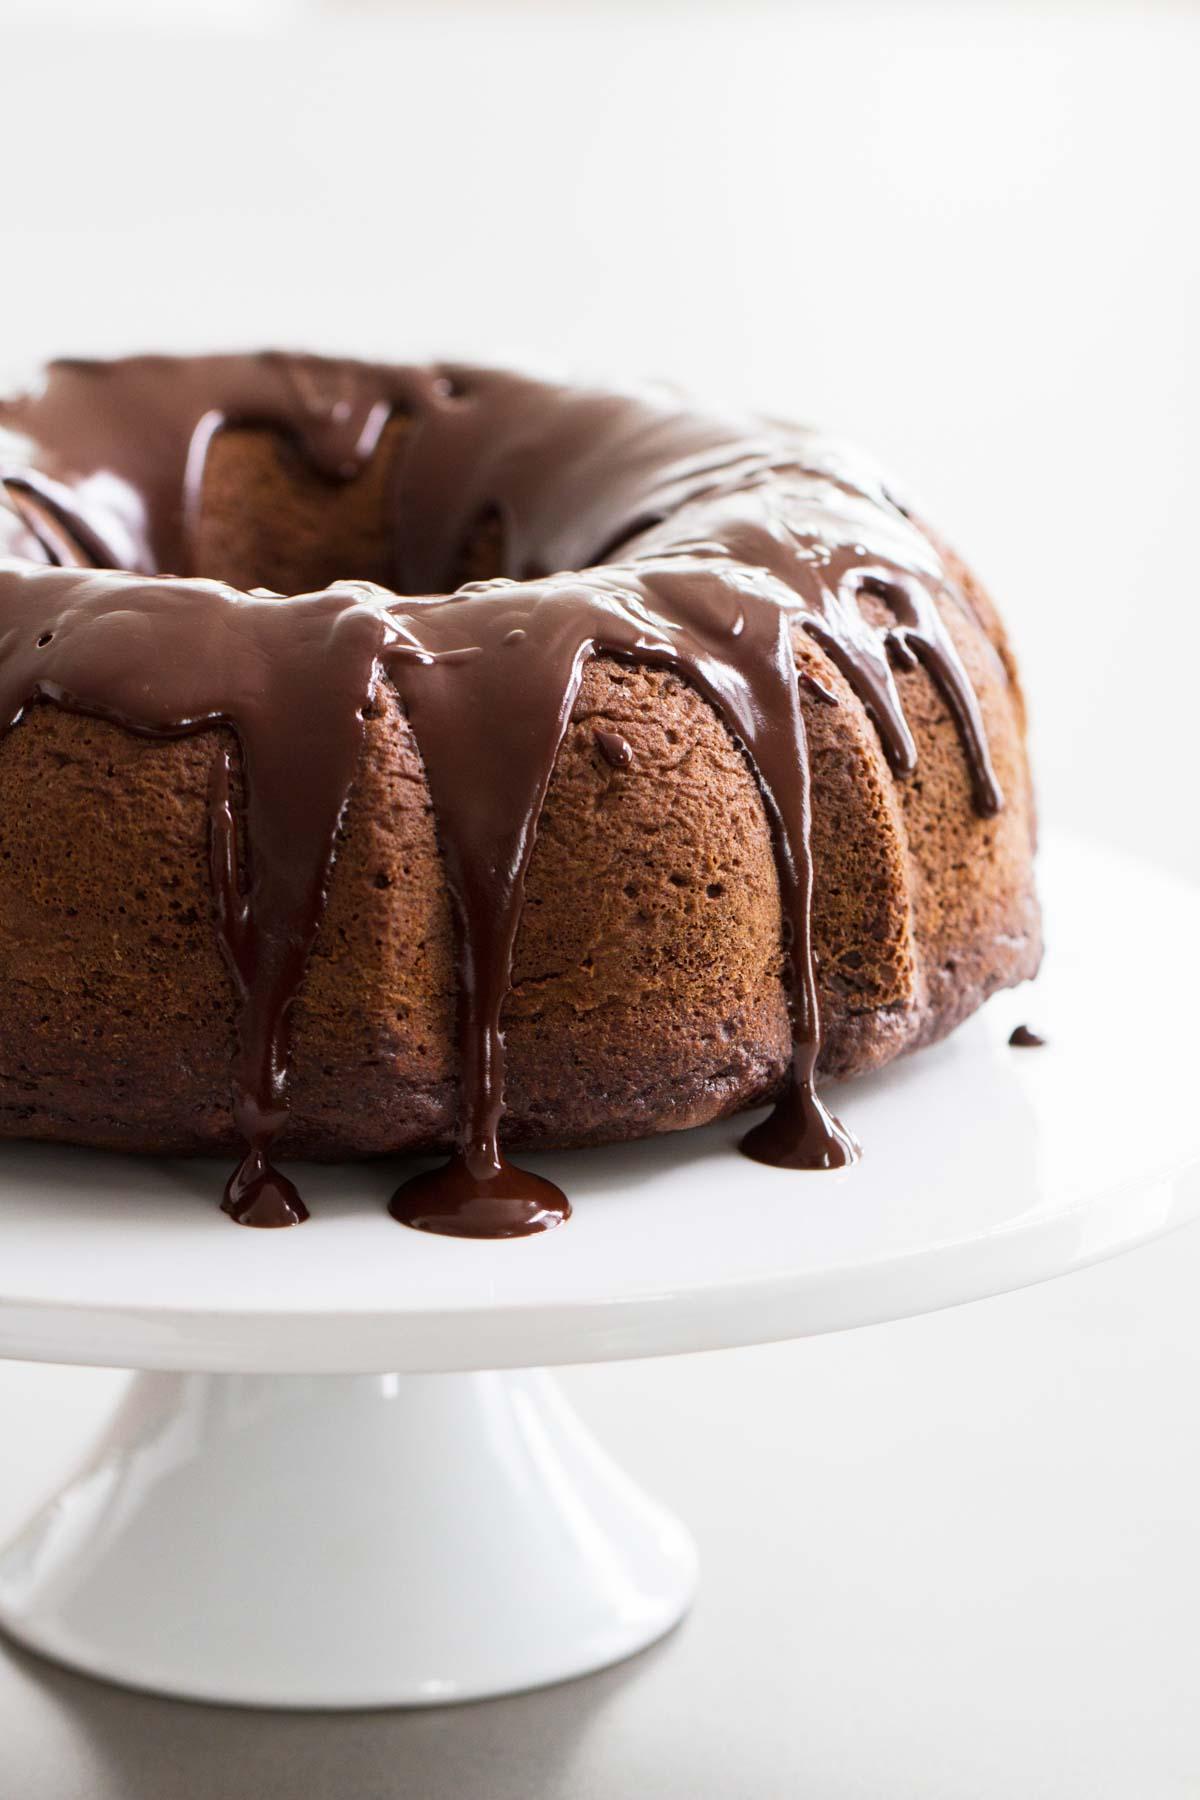 Chocolate Covered Banana Bread